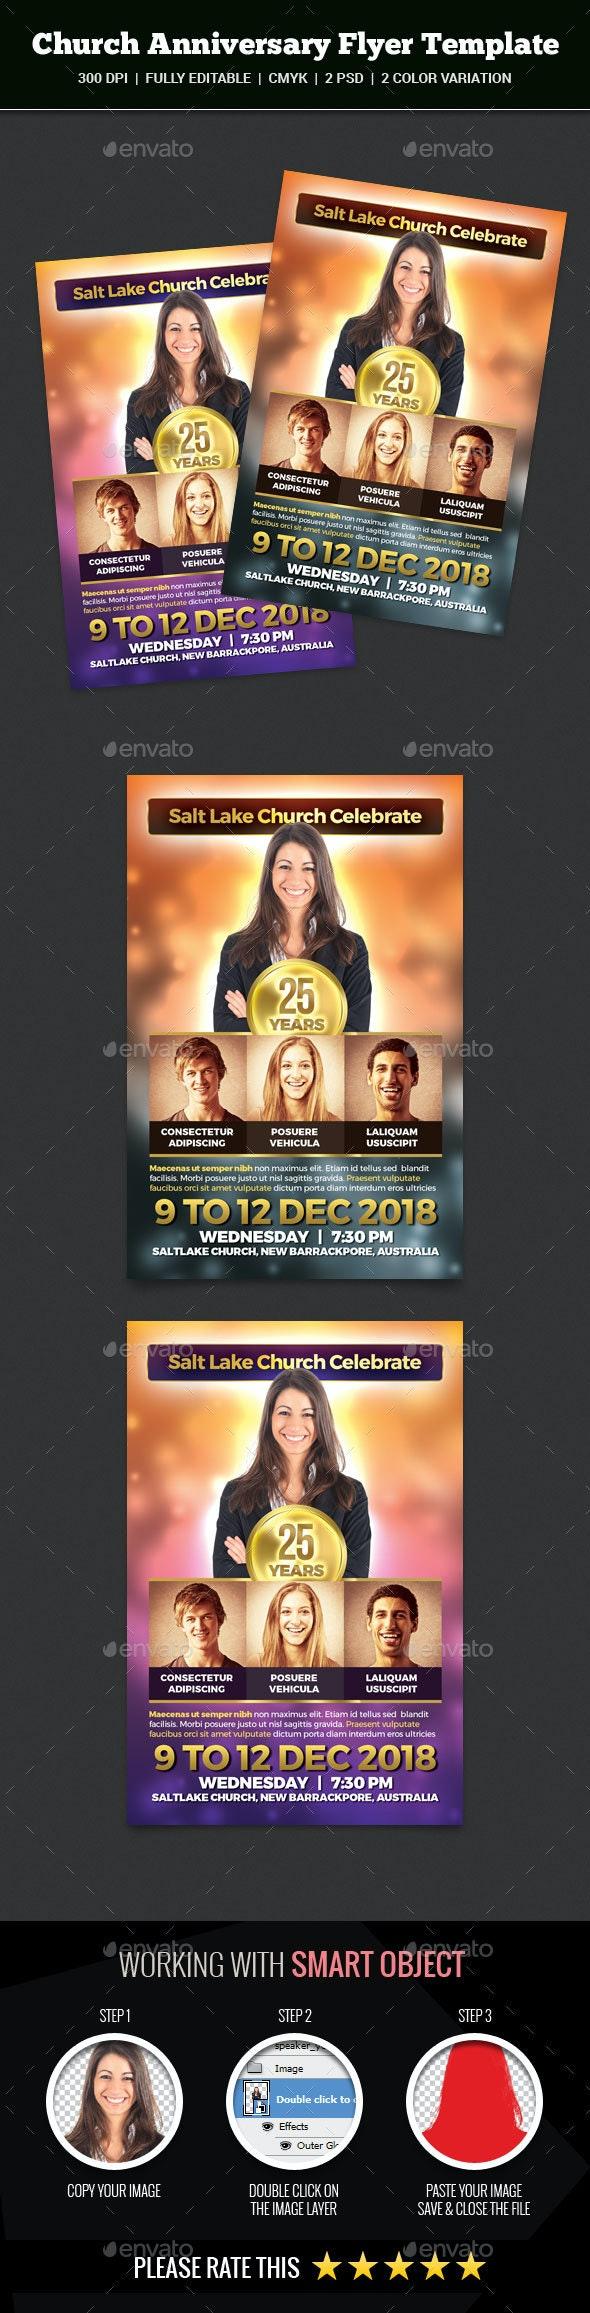 Church Anniversary Flyer - Church Flyers